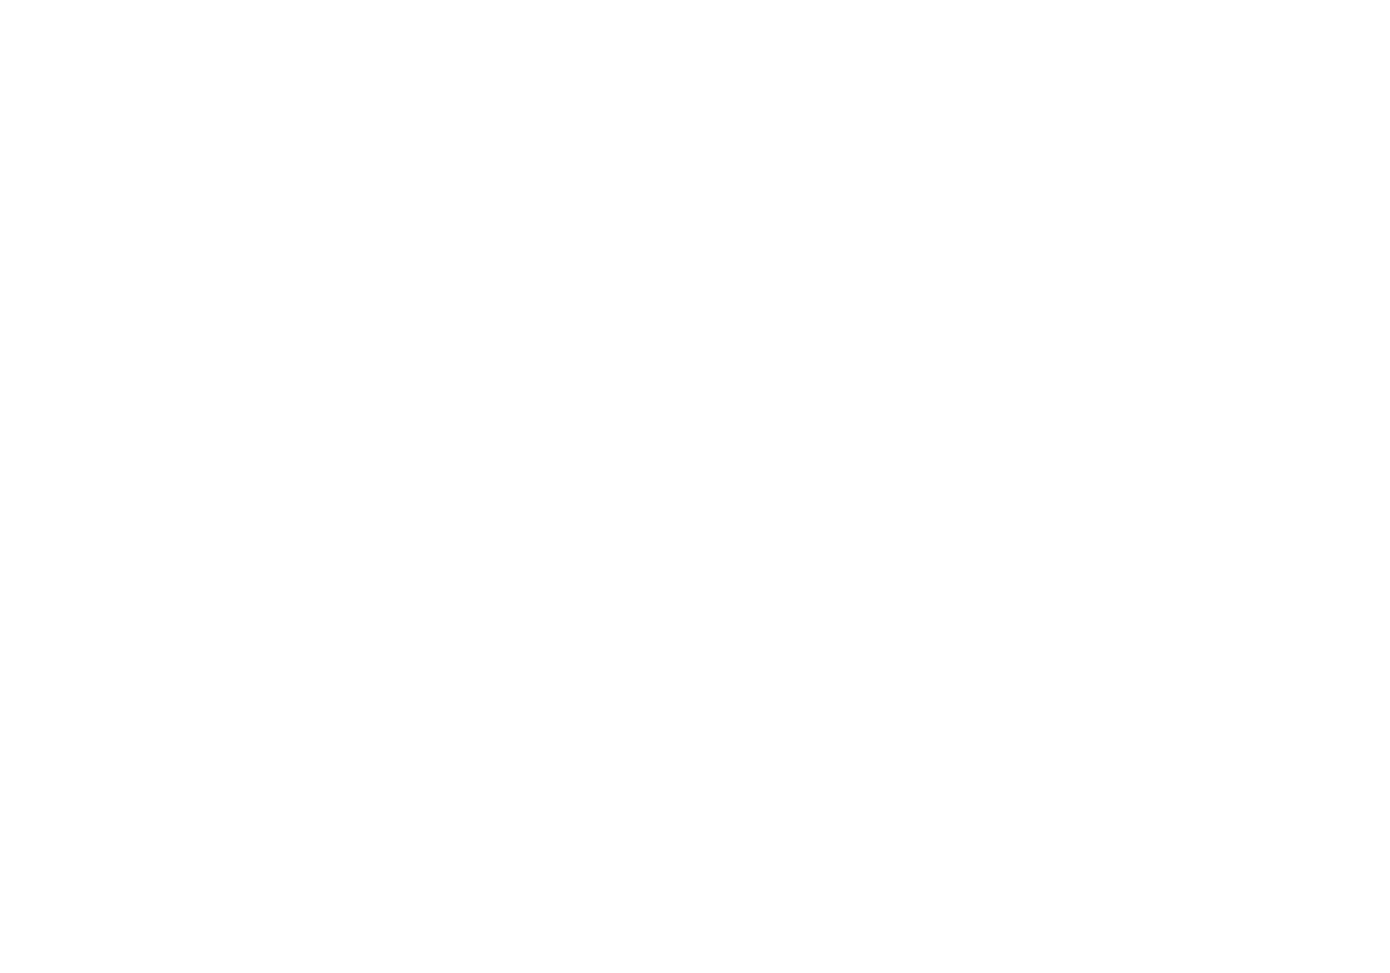 sgfundme.png